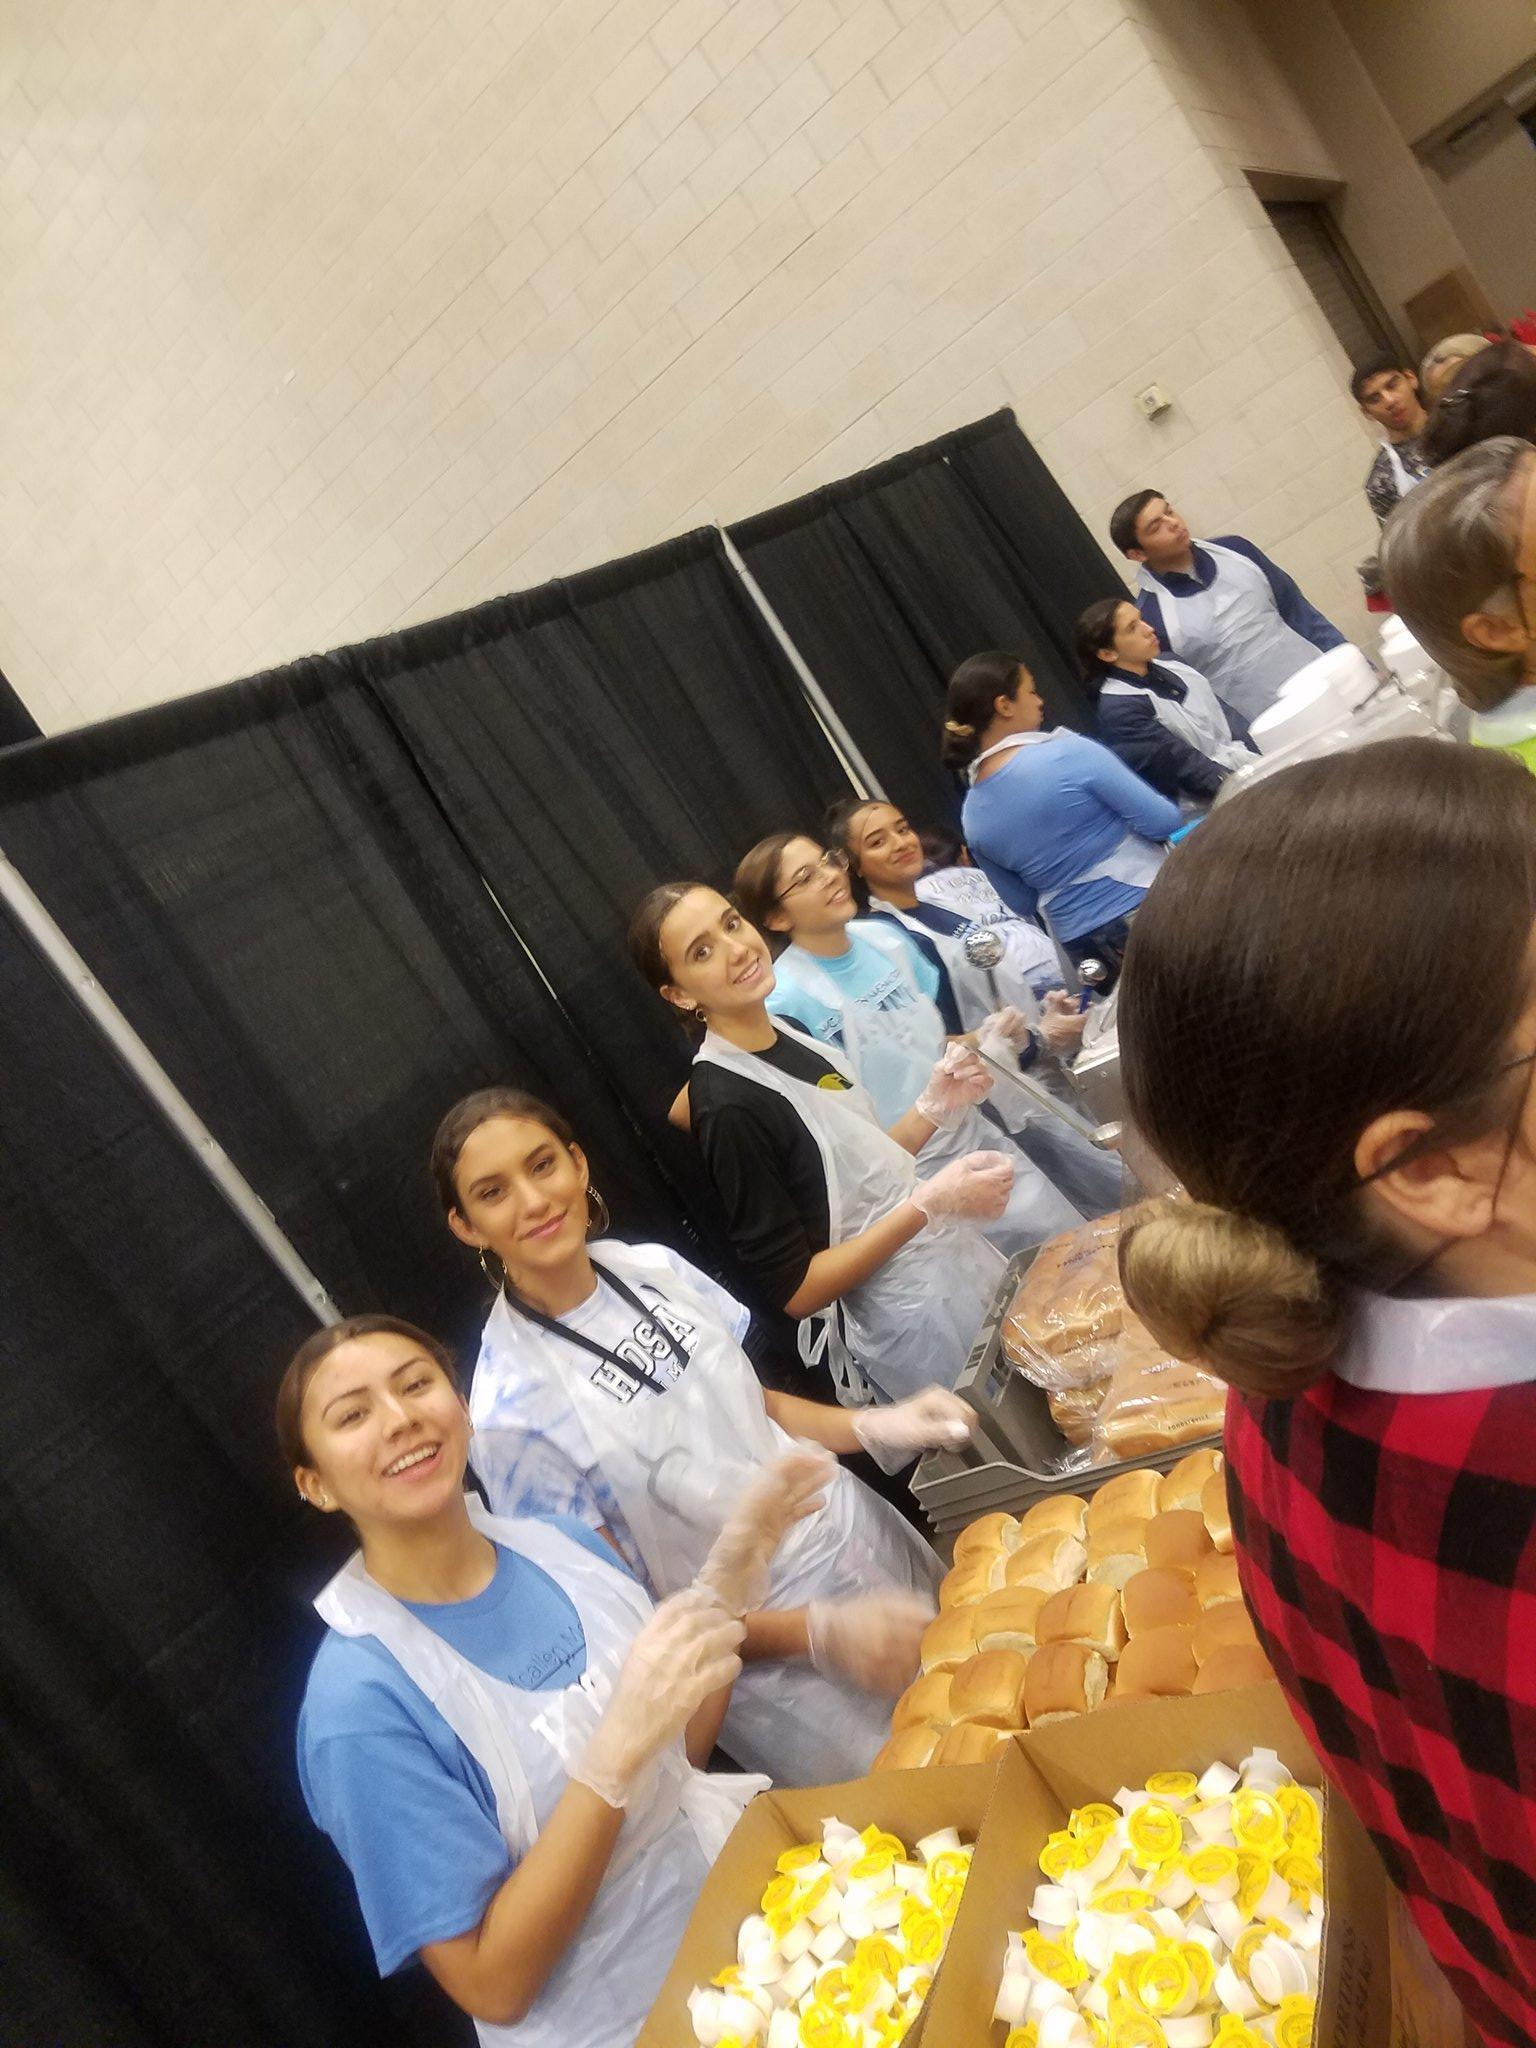 students in aprons volunteering